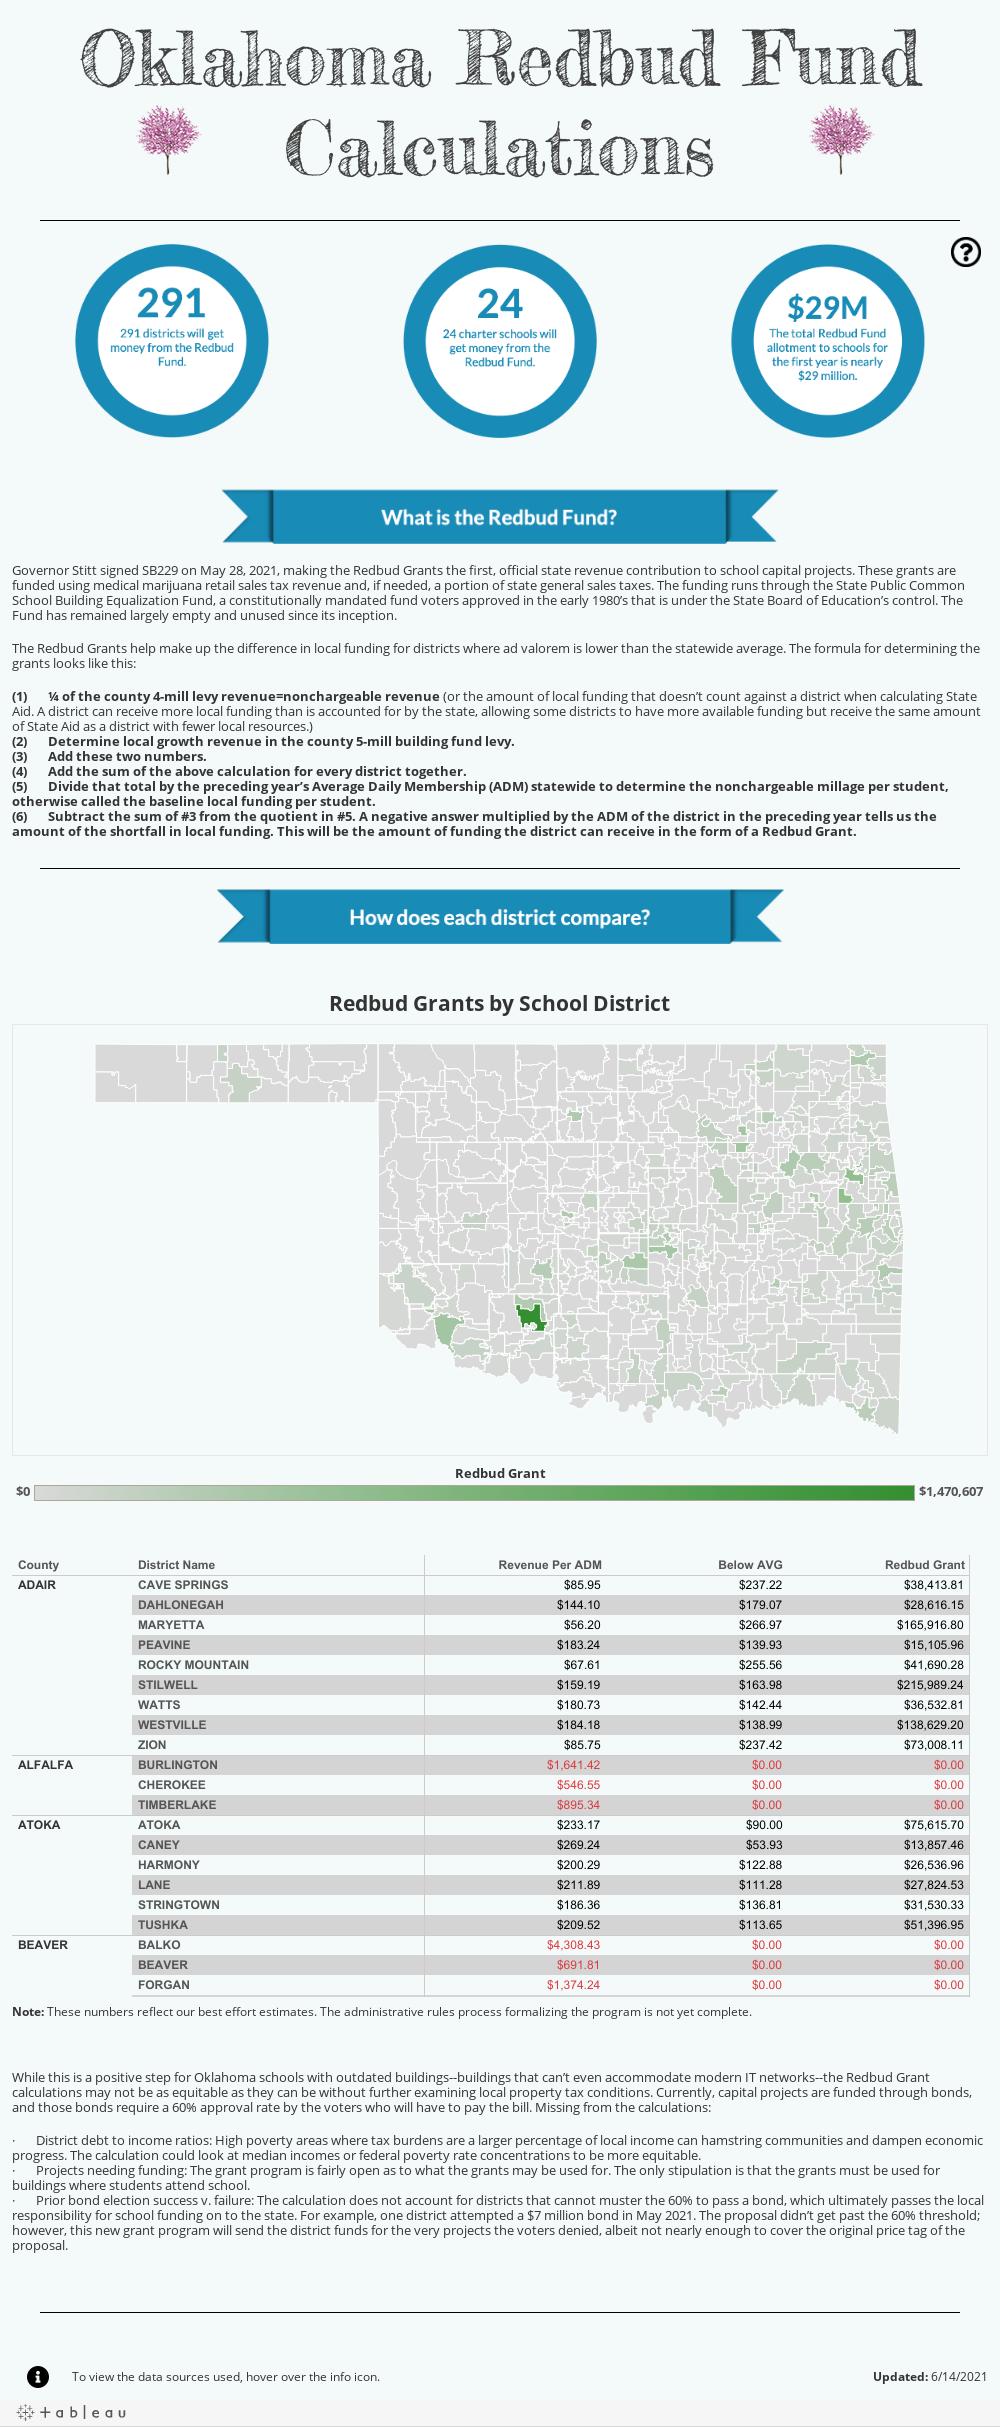 Oklahoma Redbud Fund Calculations